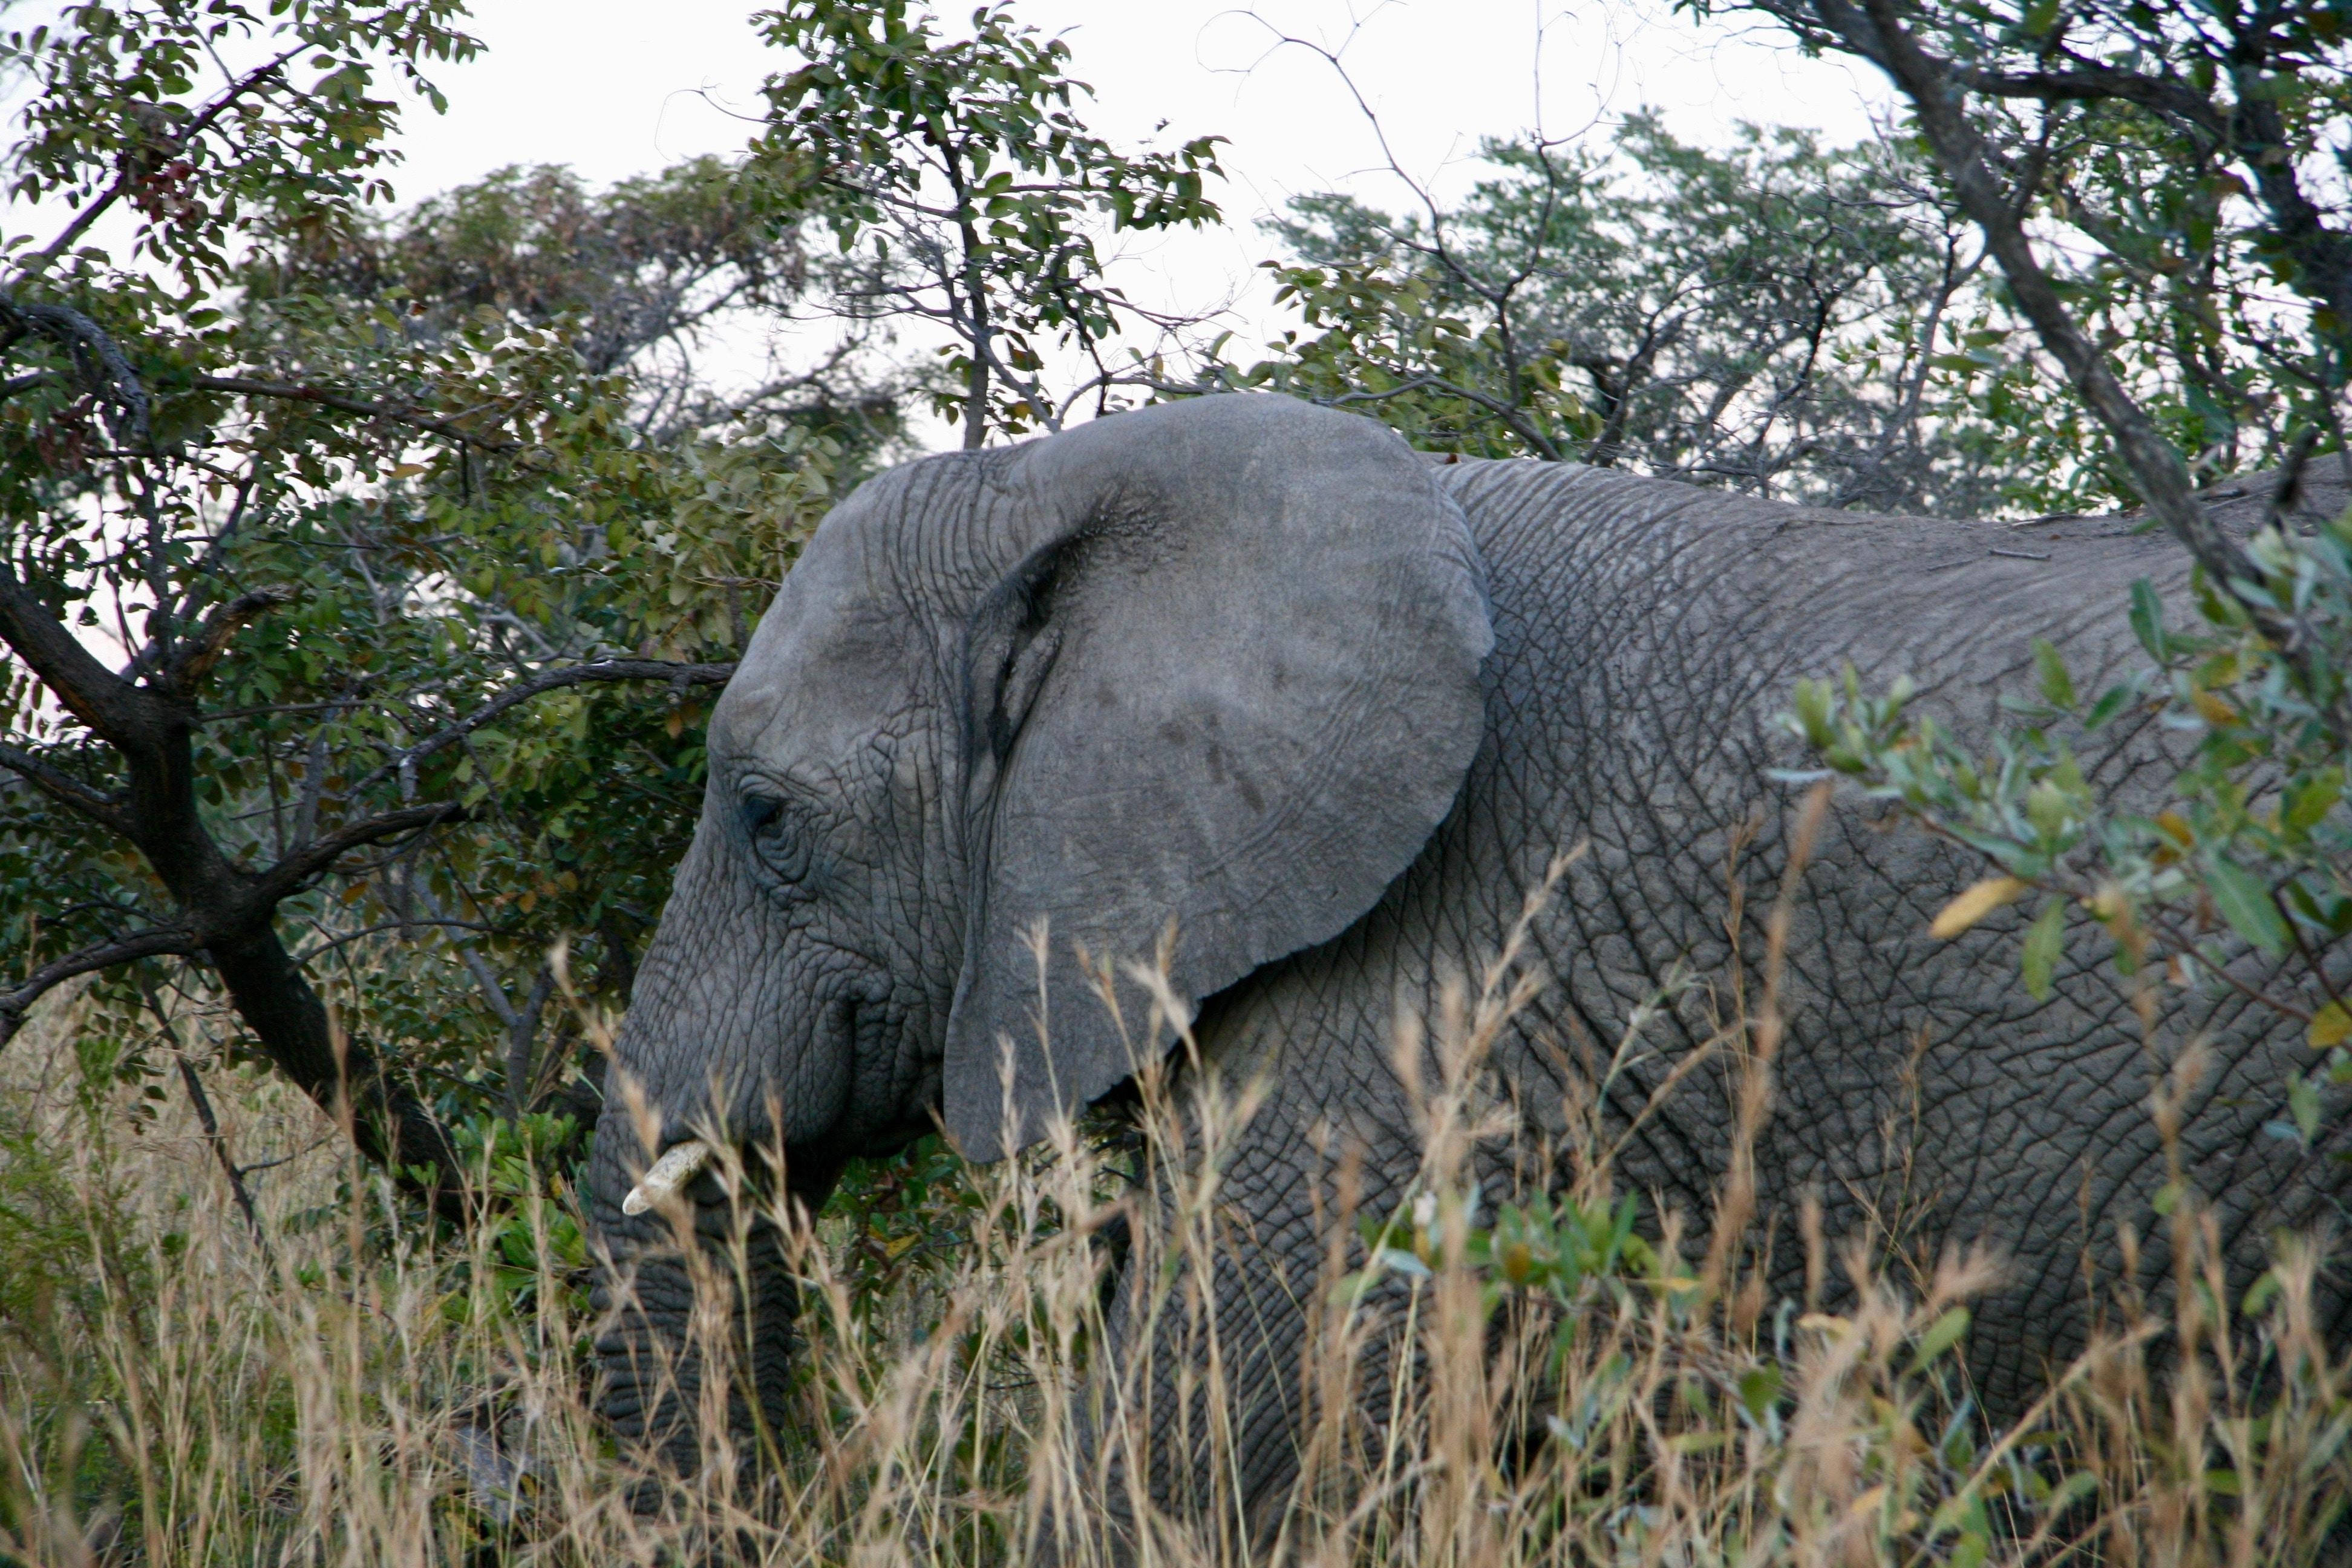 gray elephant beside trees during daytime